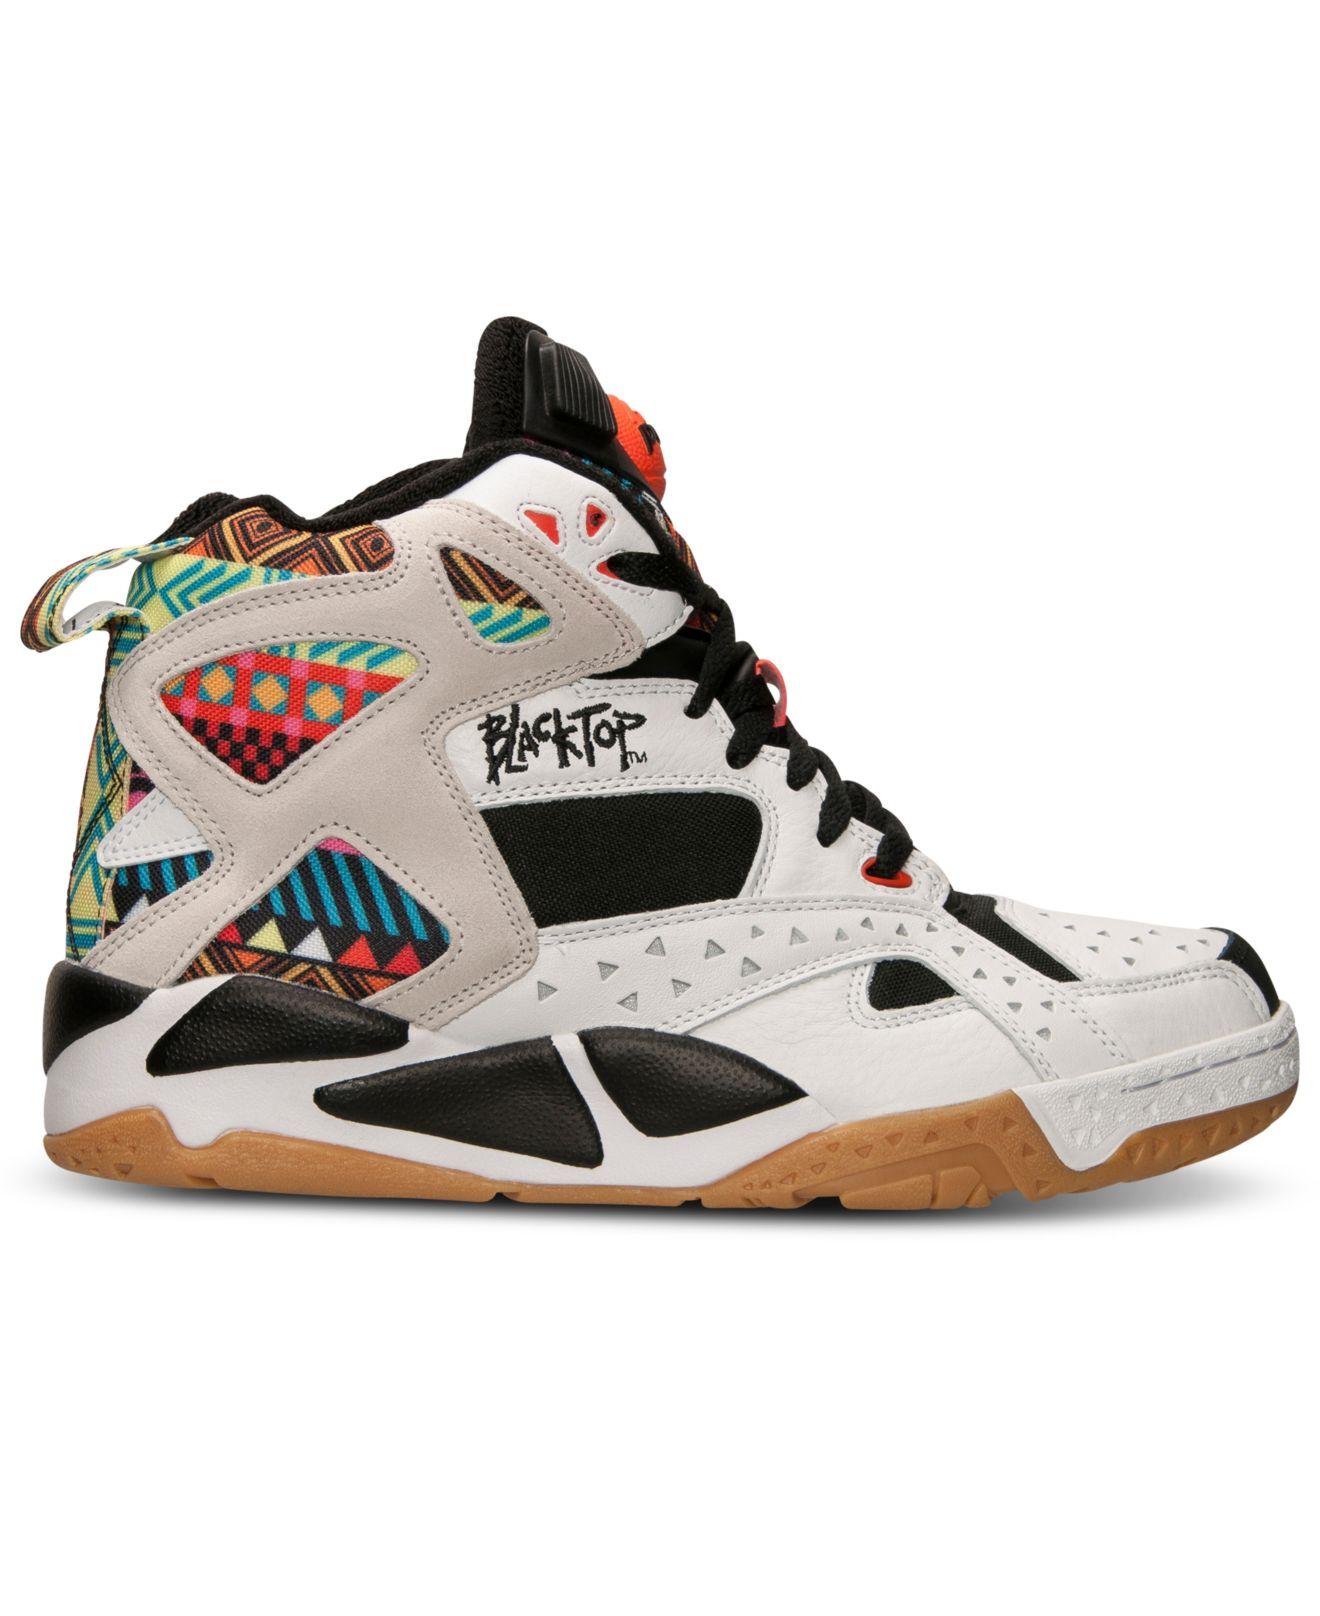 95f8195127af Lyst - Reebok Mens Blacktop Battleground Basketball Sneakers From ...